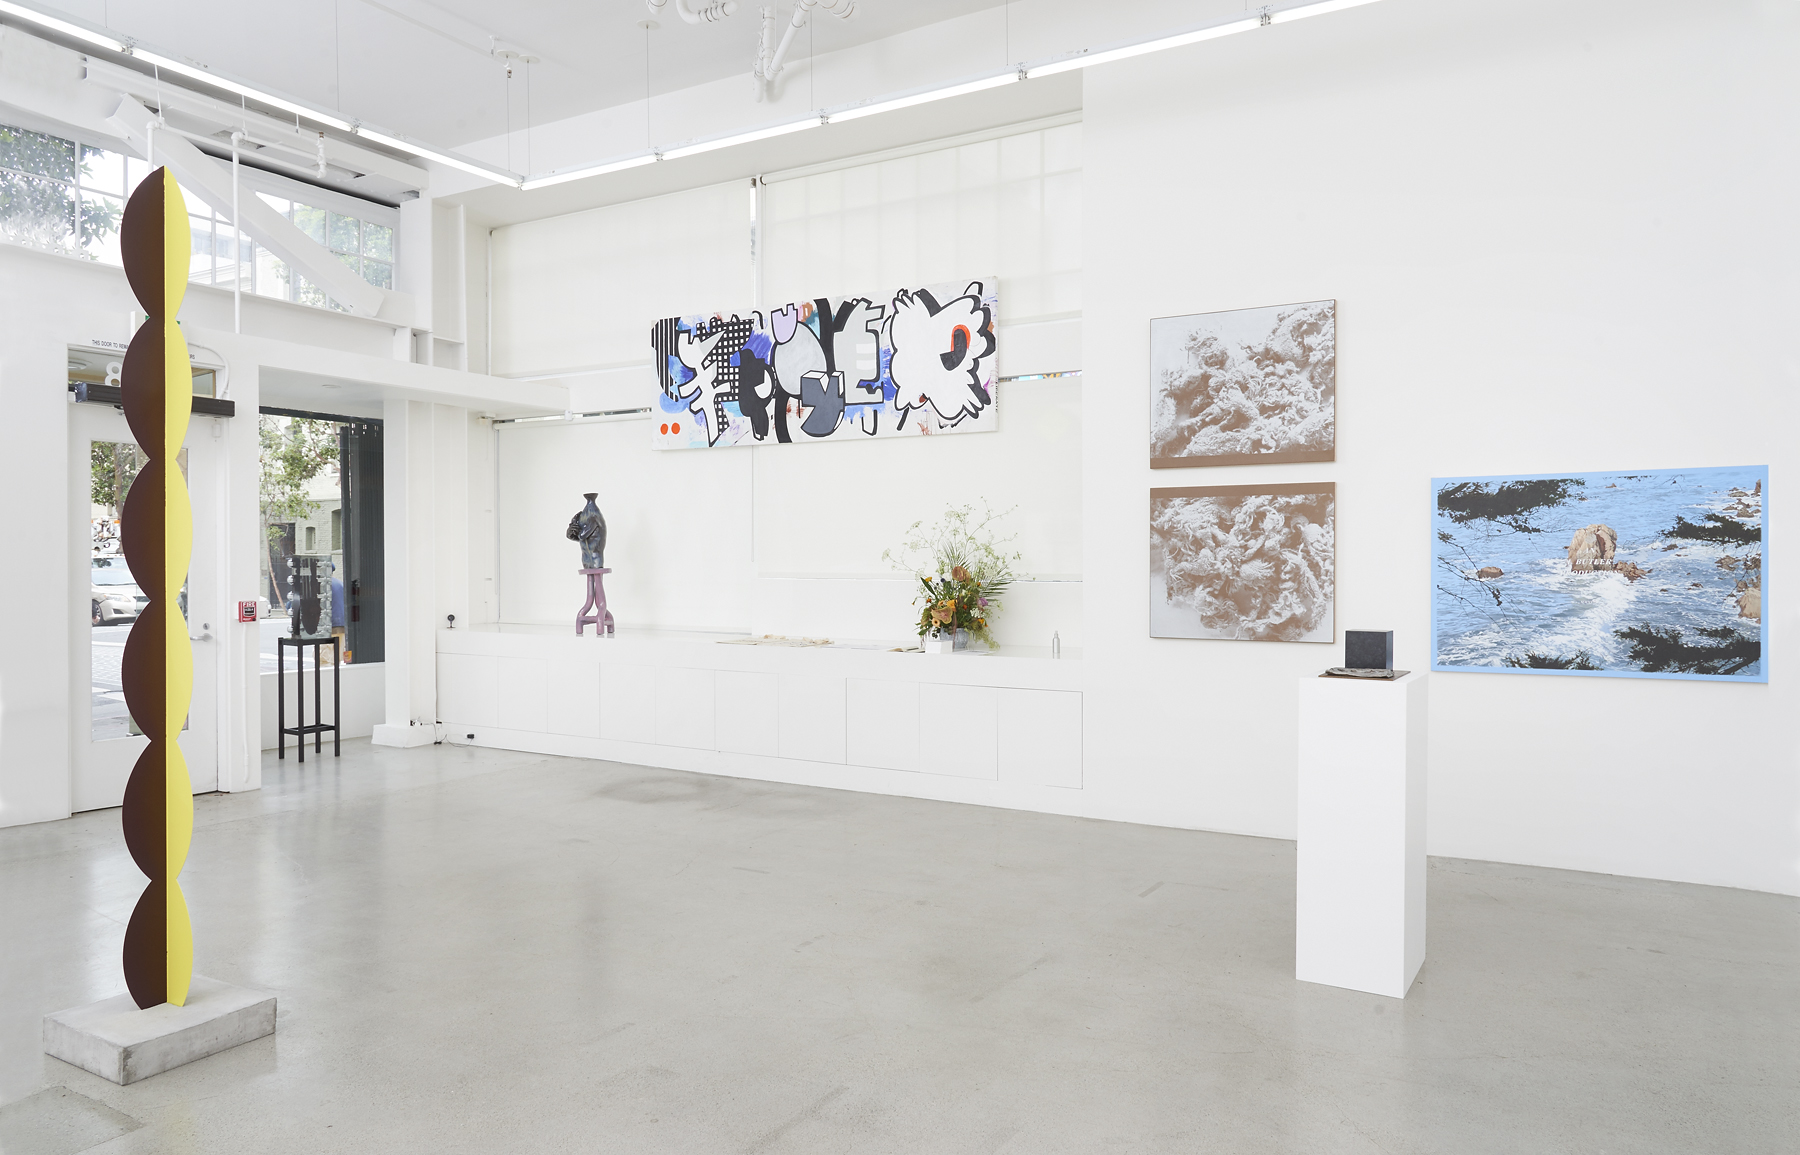 Kinship, 2018_Jessica Silverman Gallery, Installation view 05.PRS.jpg